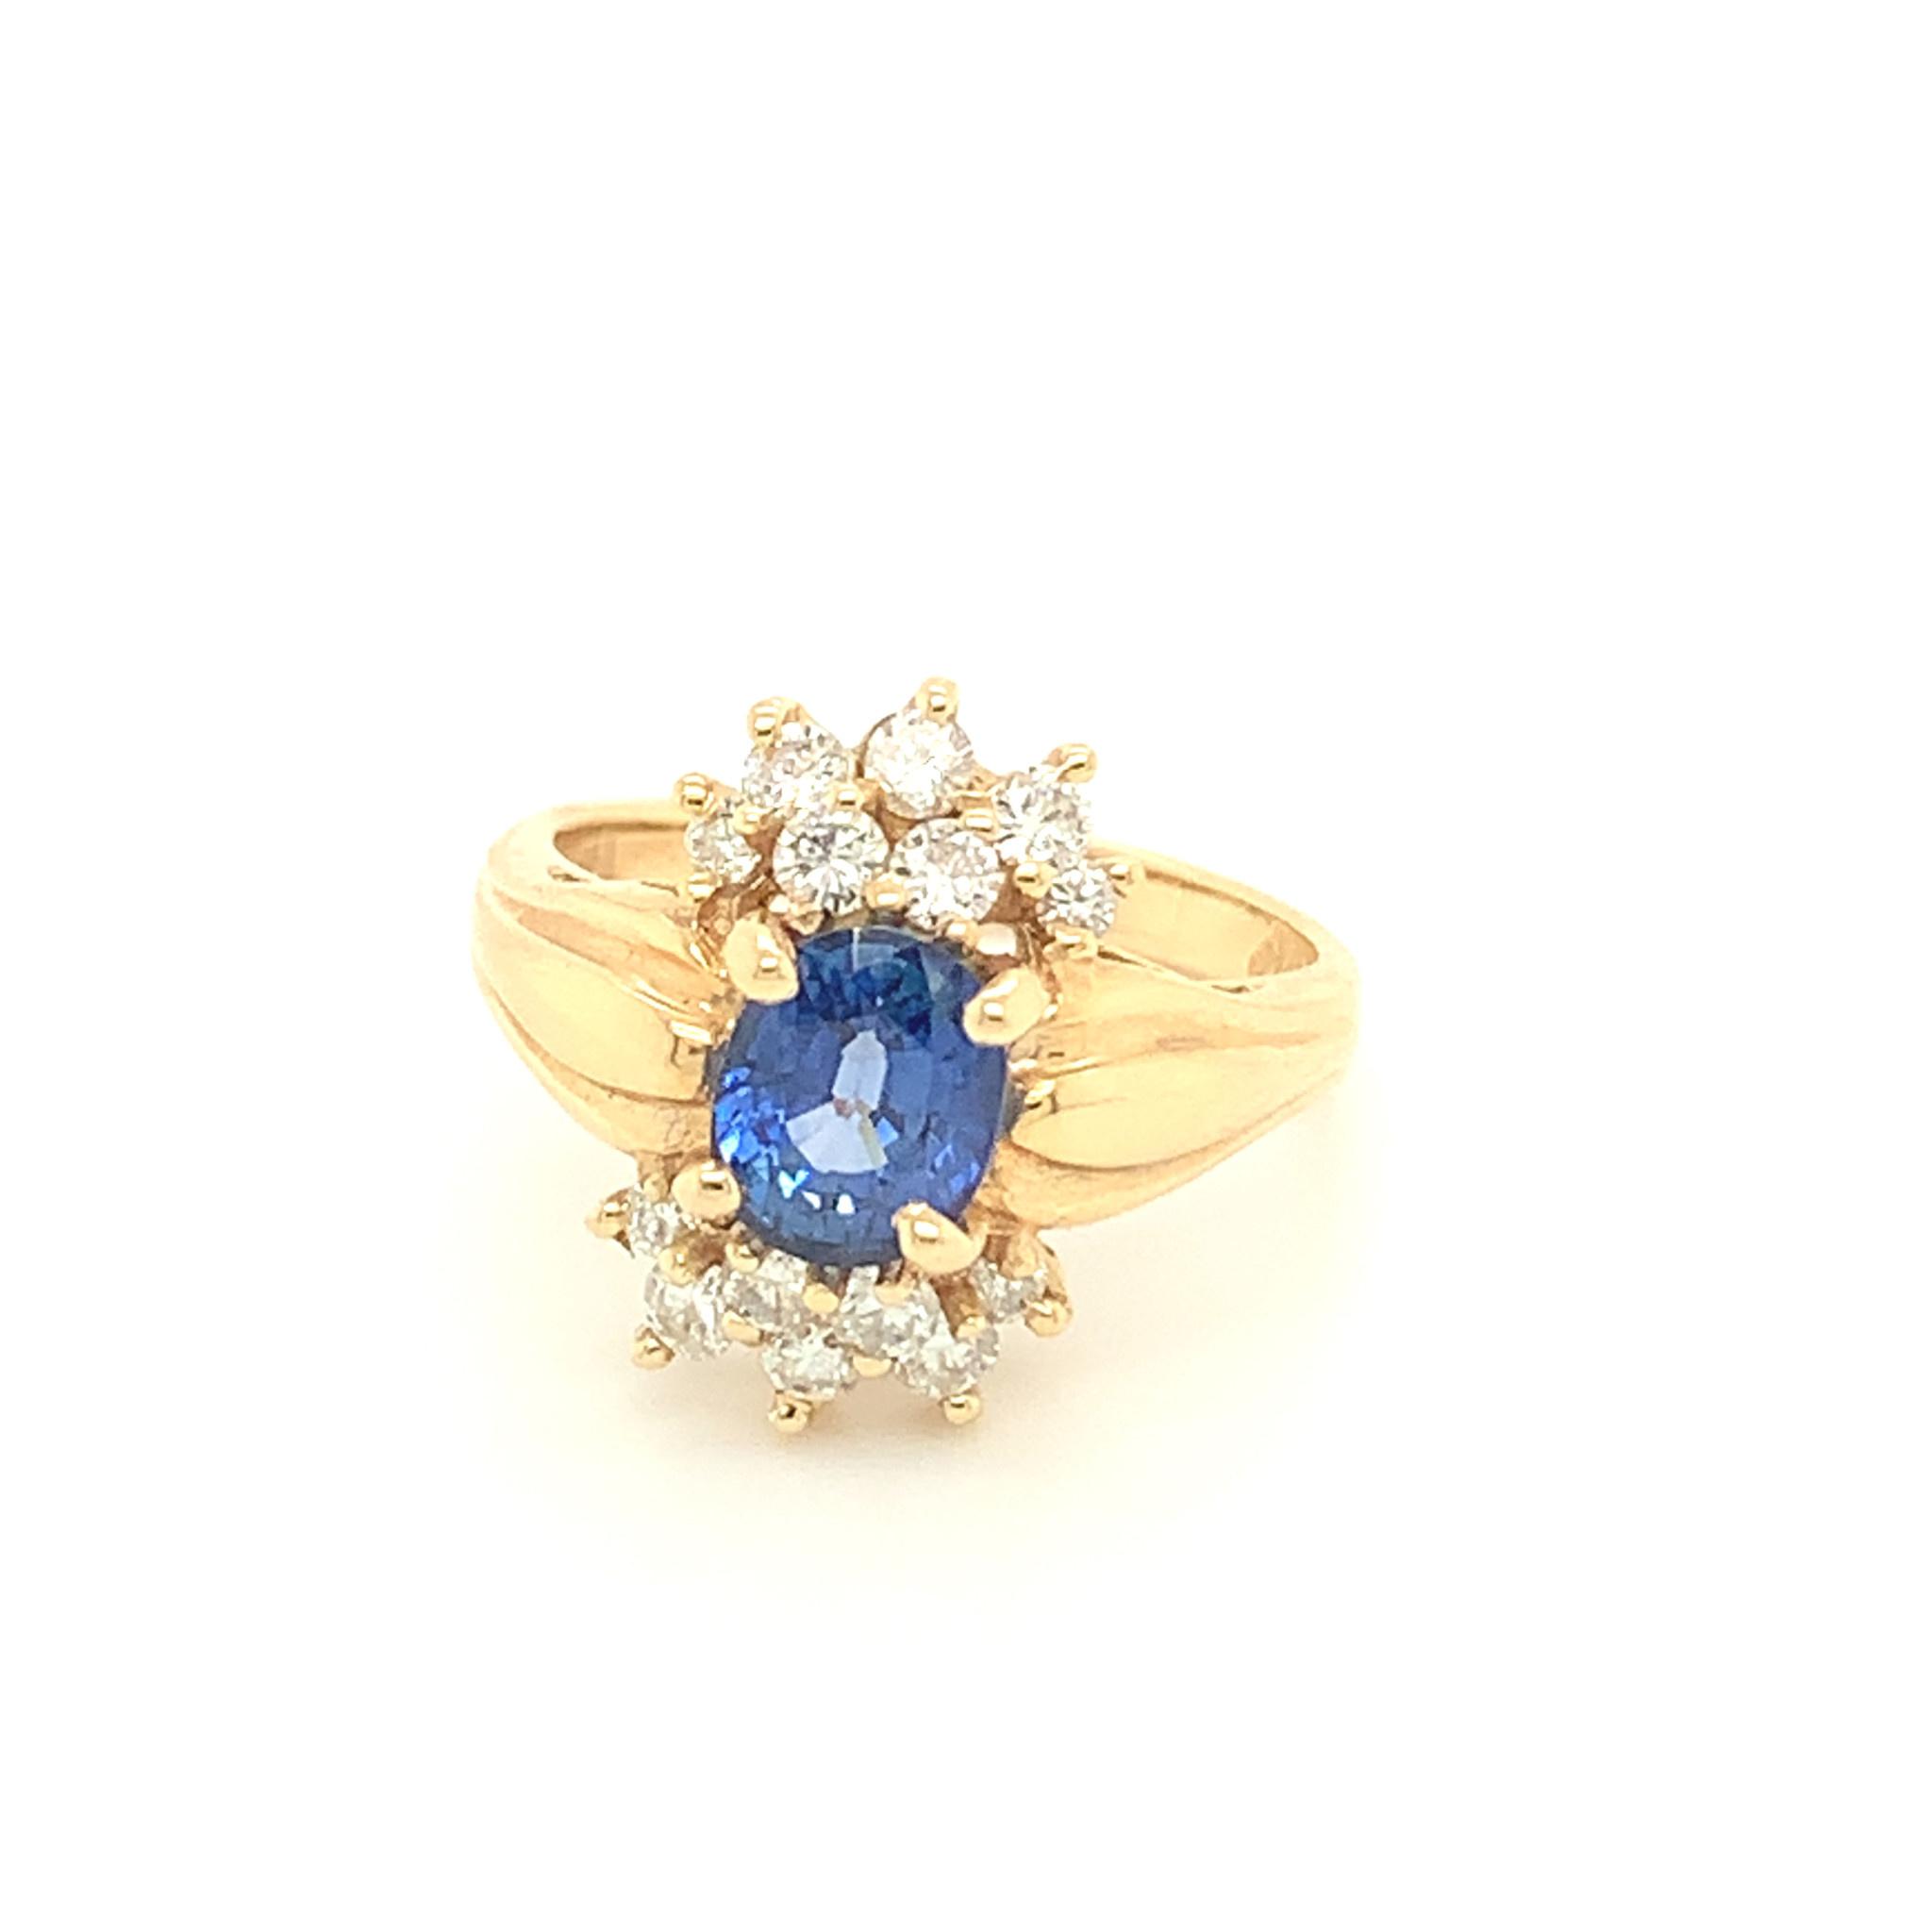 1.52ct Oval Sapphire & Diamond Ring 0.50 carat total